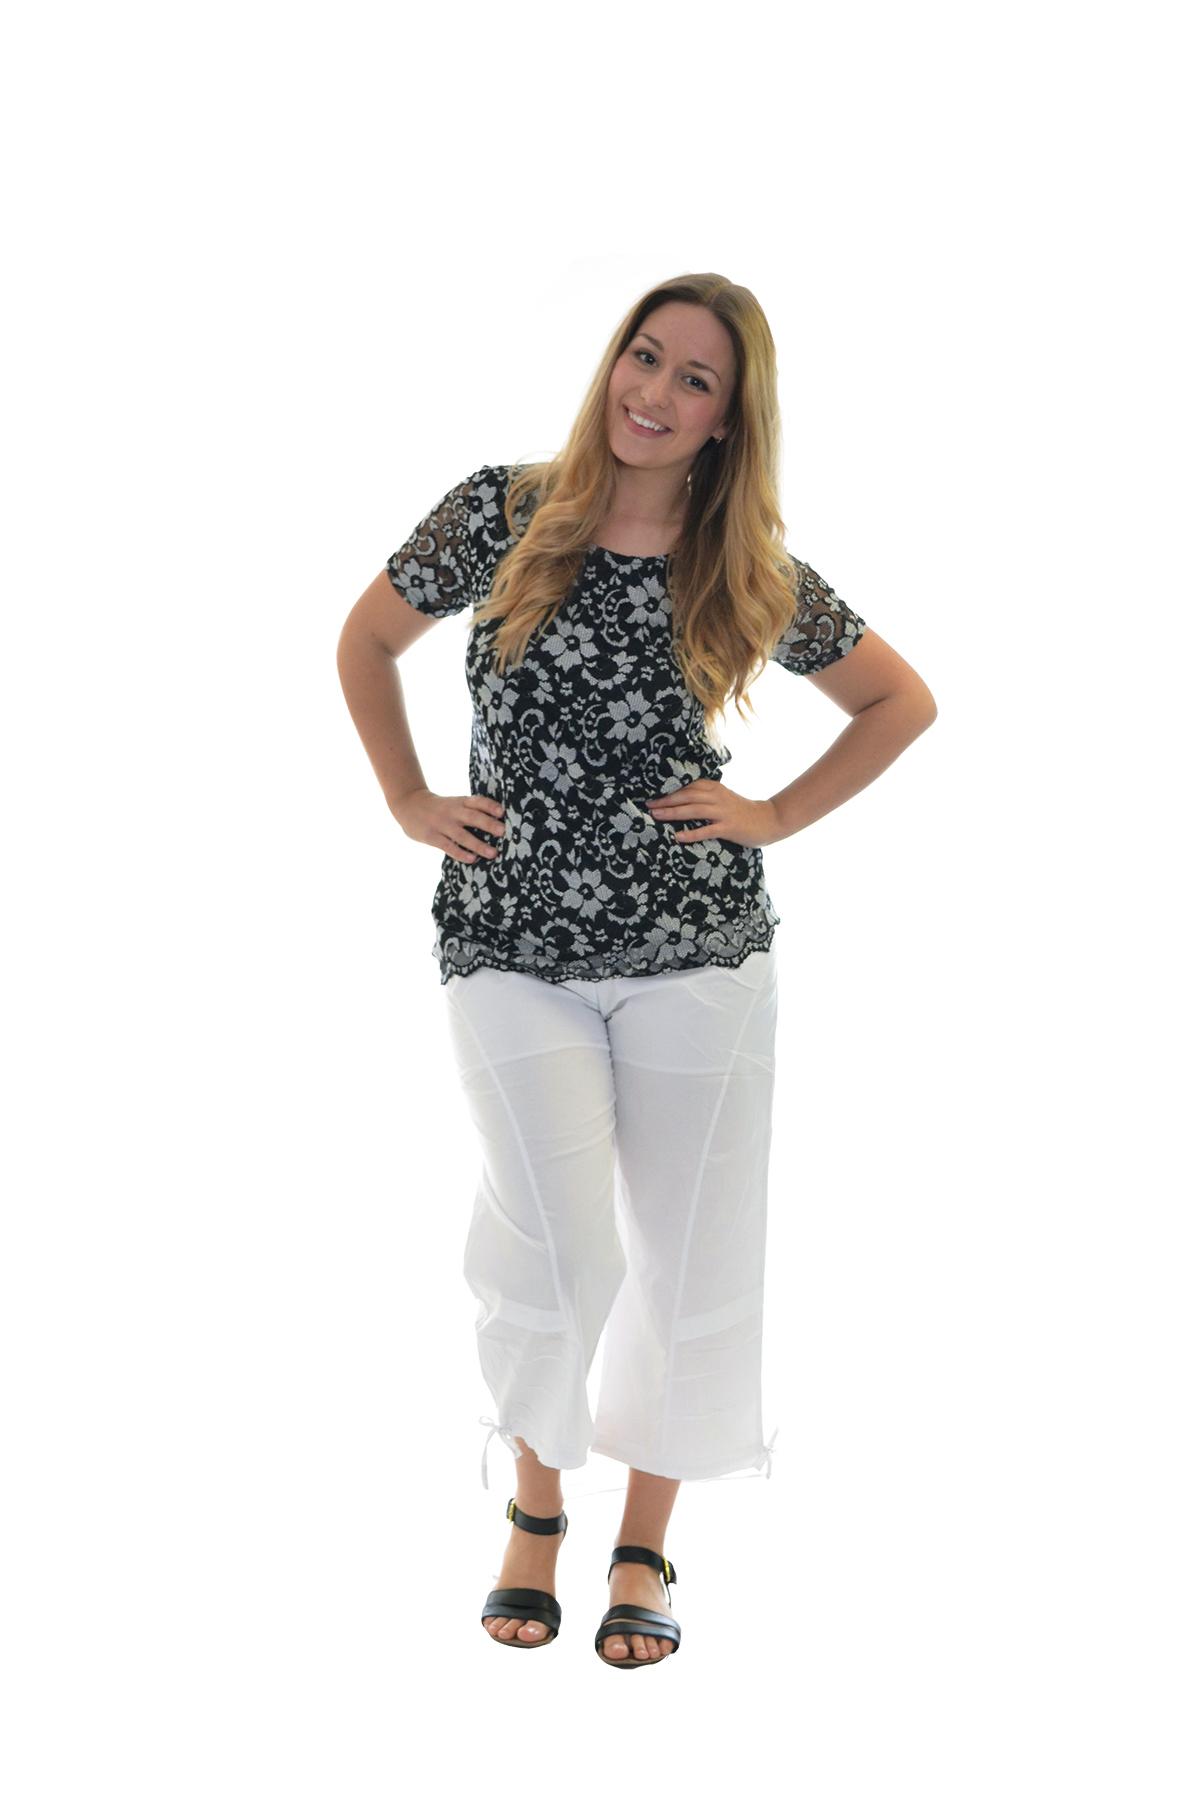 Ladies Cropped Pants Cotton Elasticated Capri Trousers Womens Summer Plus Size